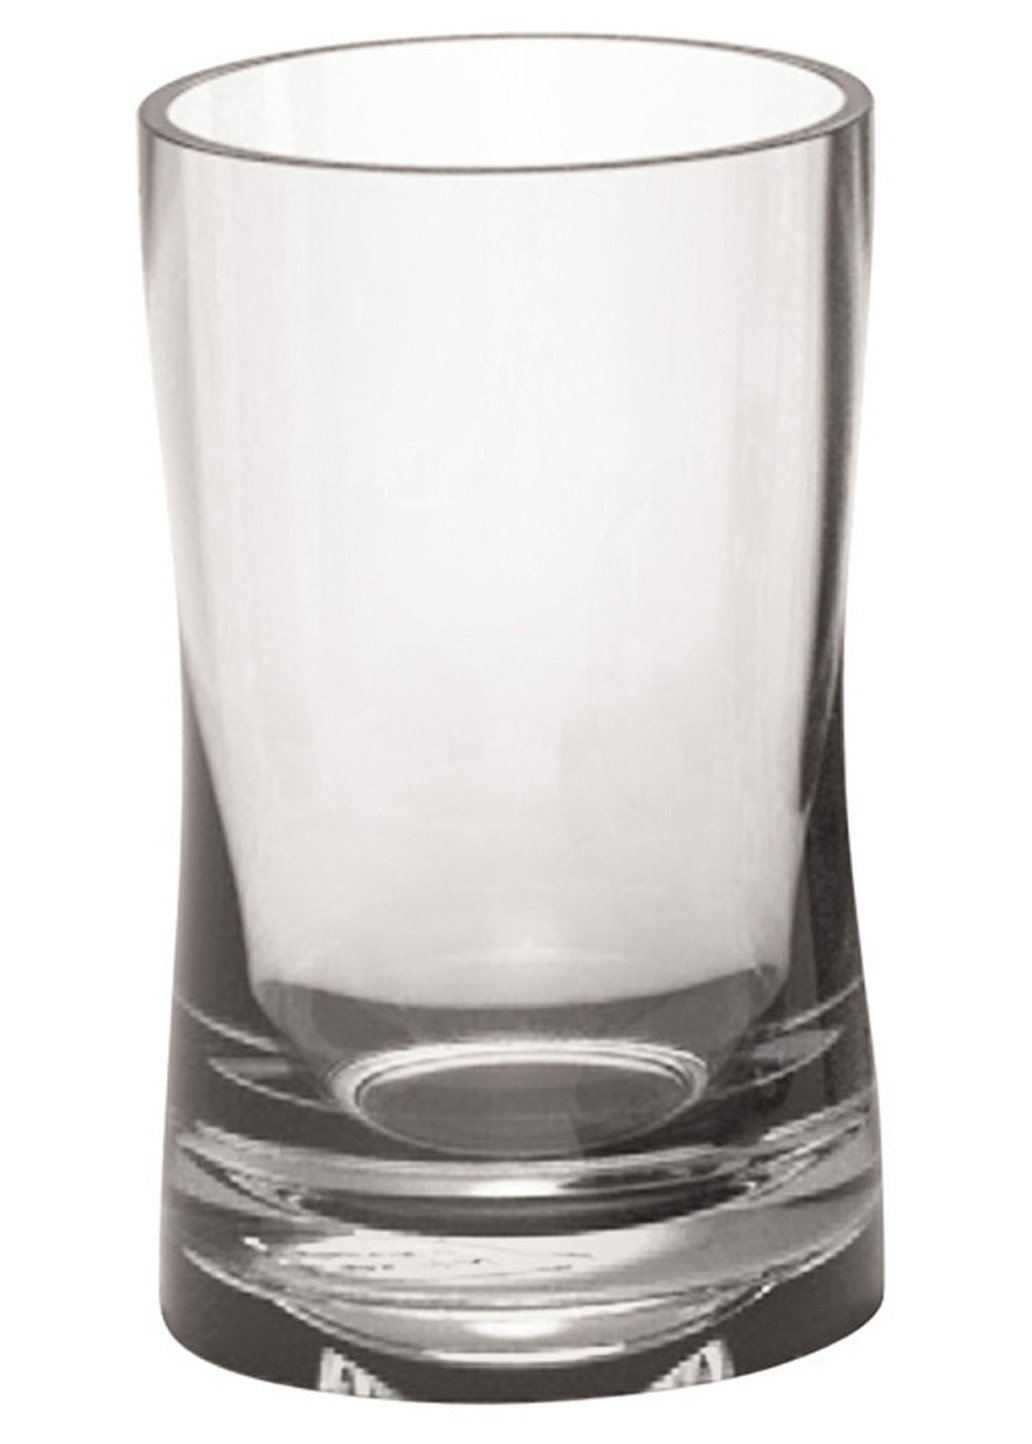 Seifenspender Fortune Clear B:6,5cm